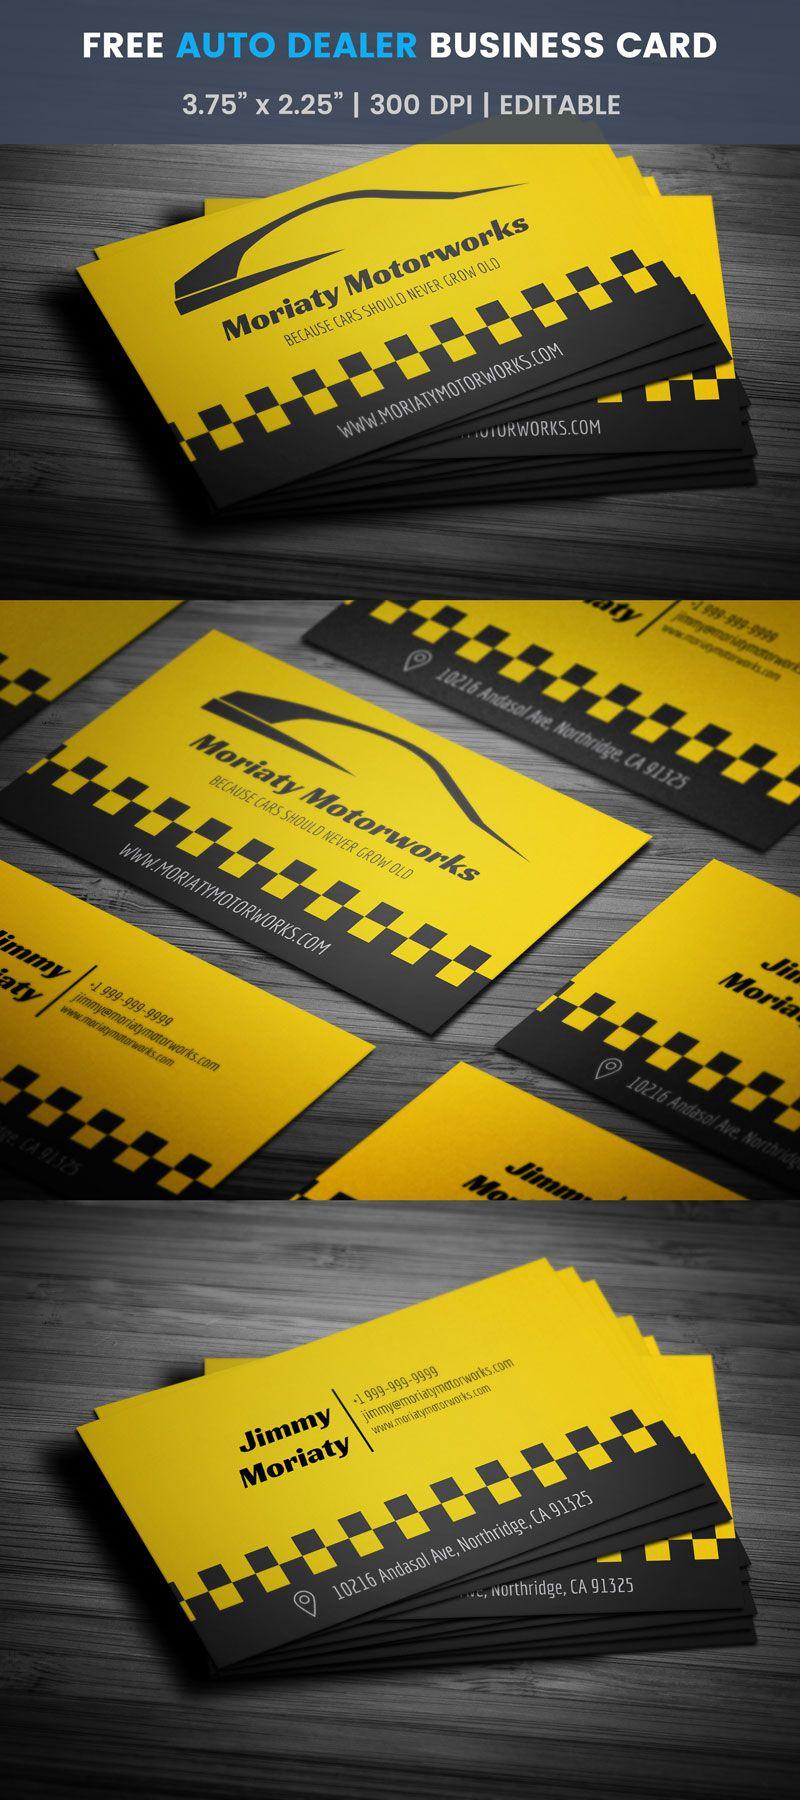 Auto Dealer Business Card Full Preview Pinterest